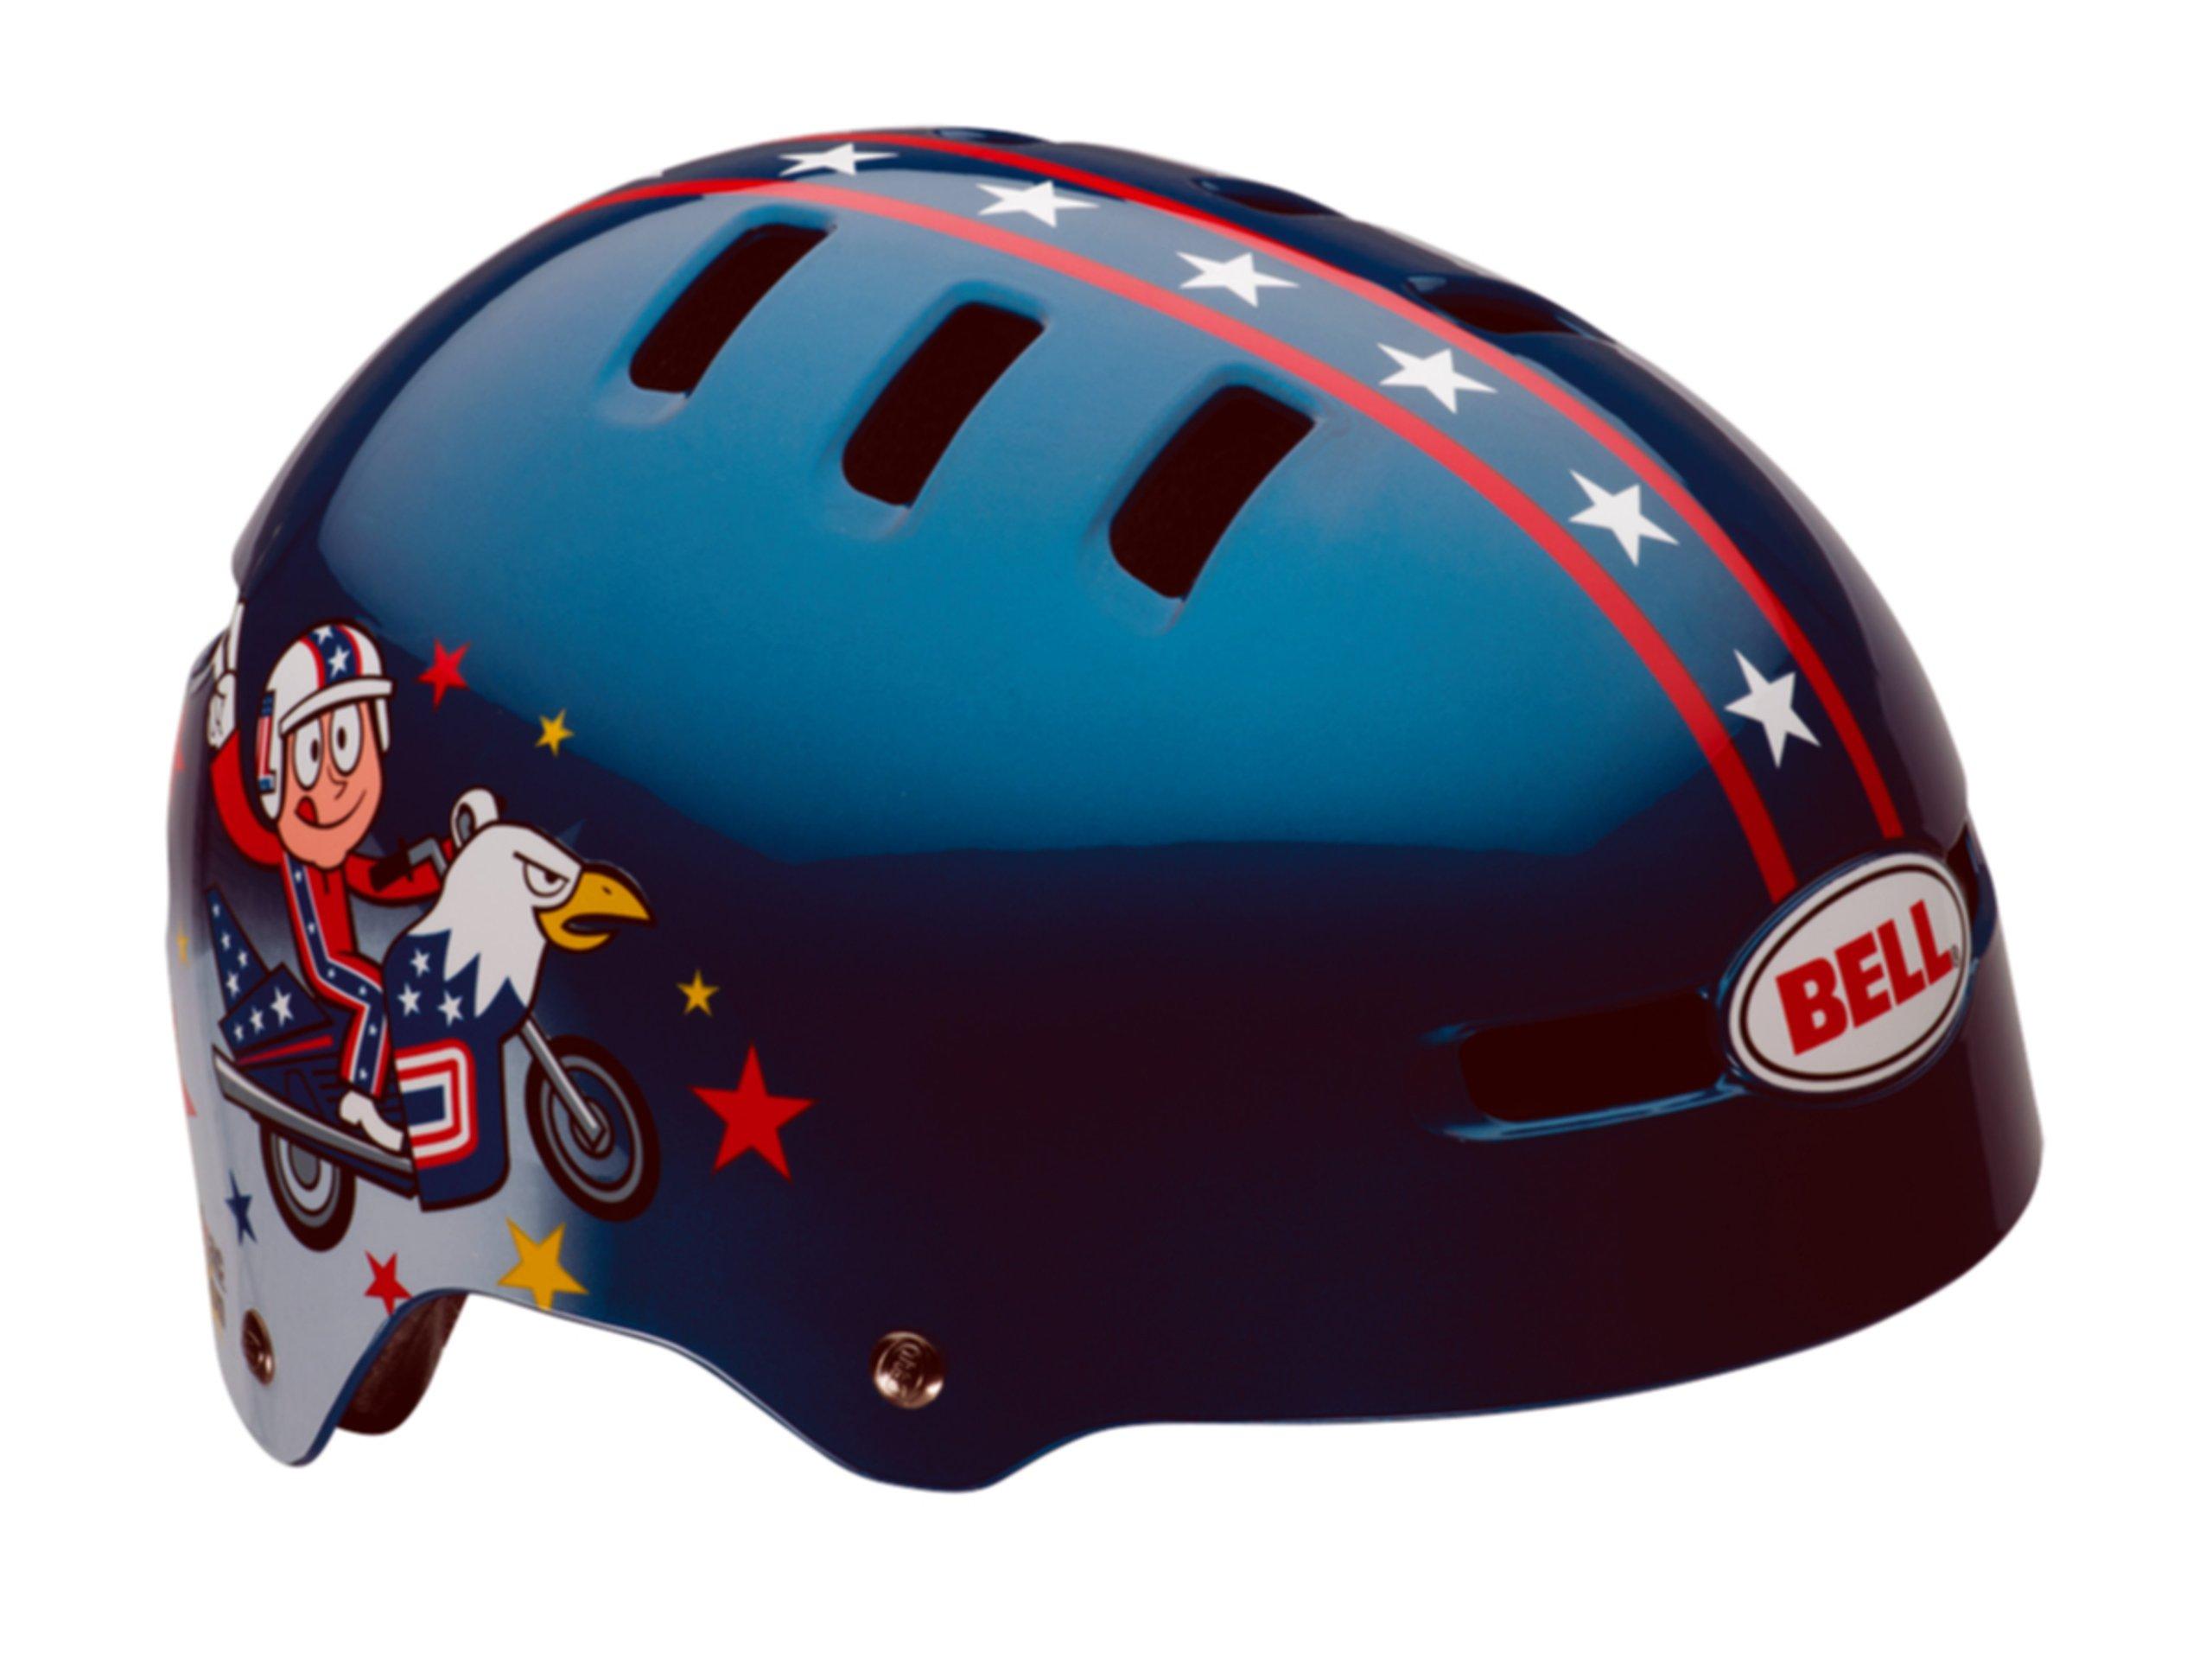 Bell Fraction Youth Multi-Sport Kid Knievel Helmet (Blue, X-Small)